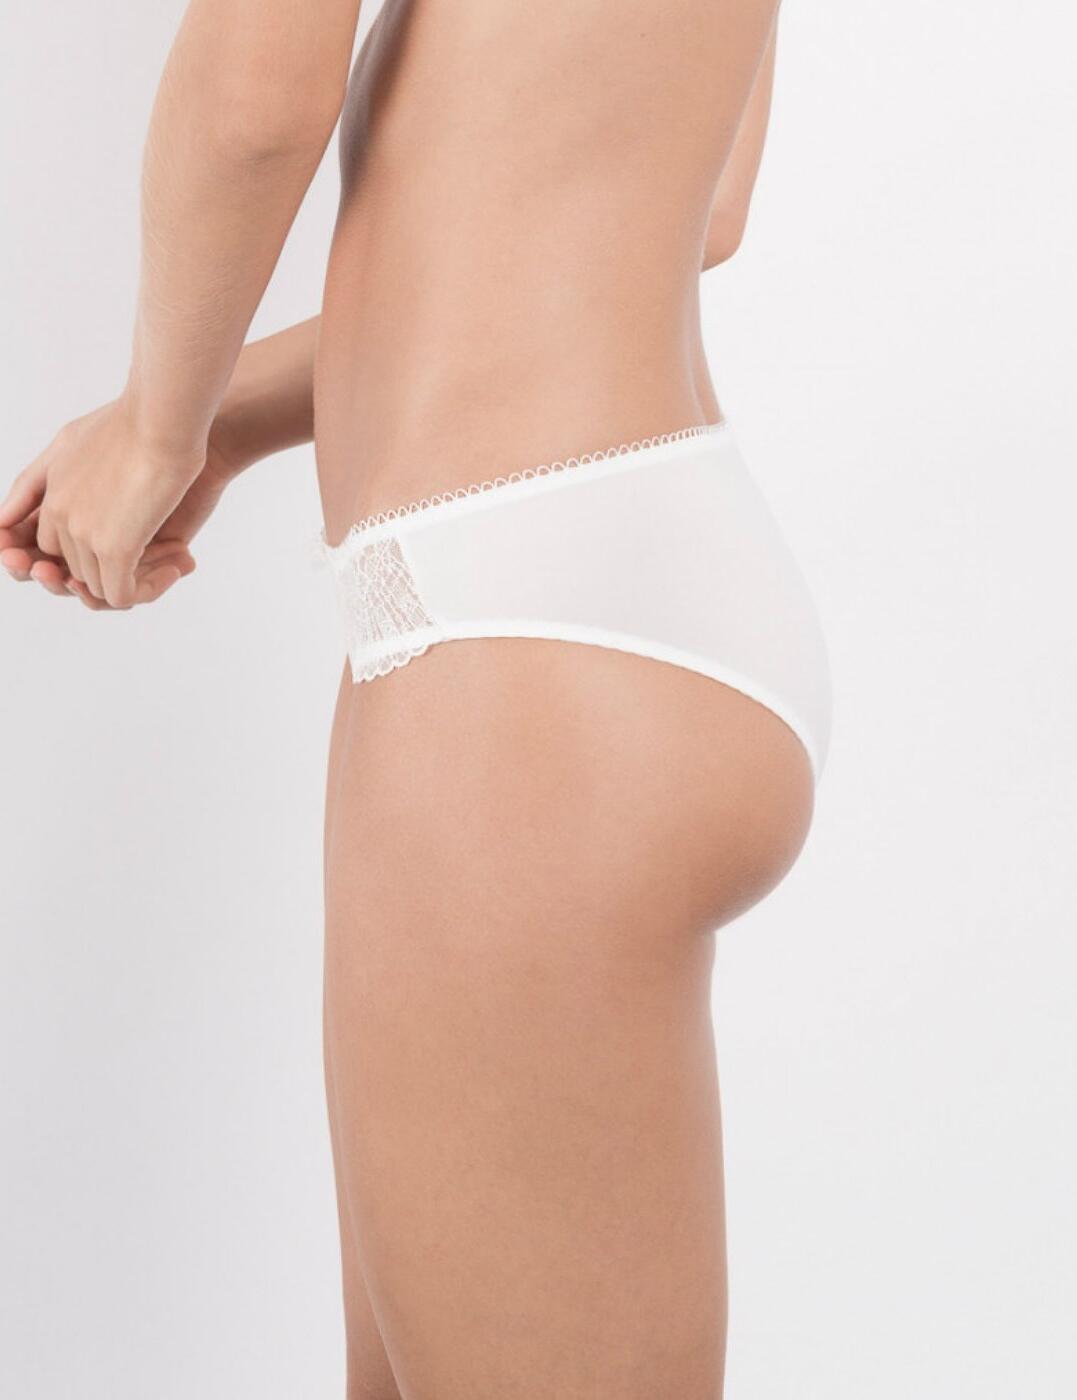 Maison Lejaby Whisper Bikini Style Brief 19363 Womens Knickers Luxury  Lingerie